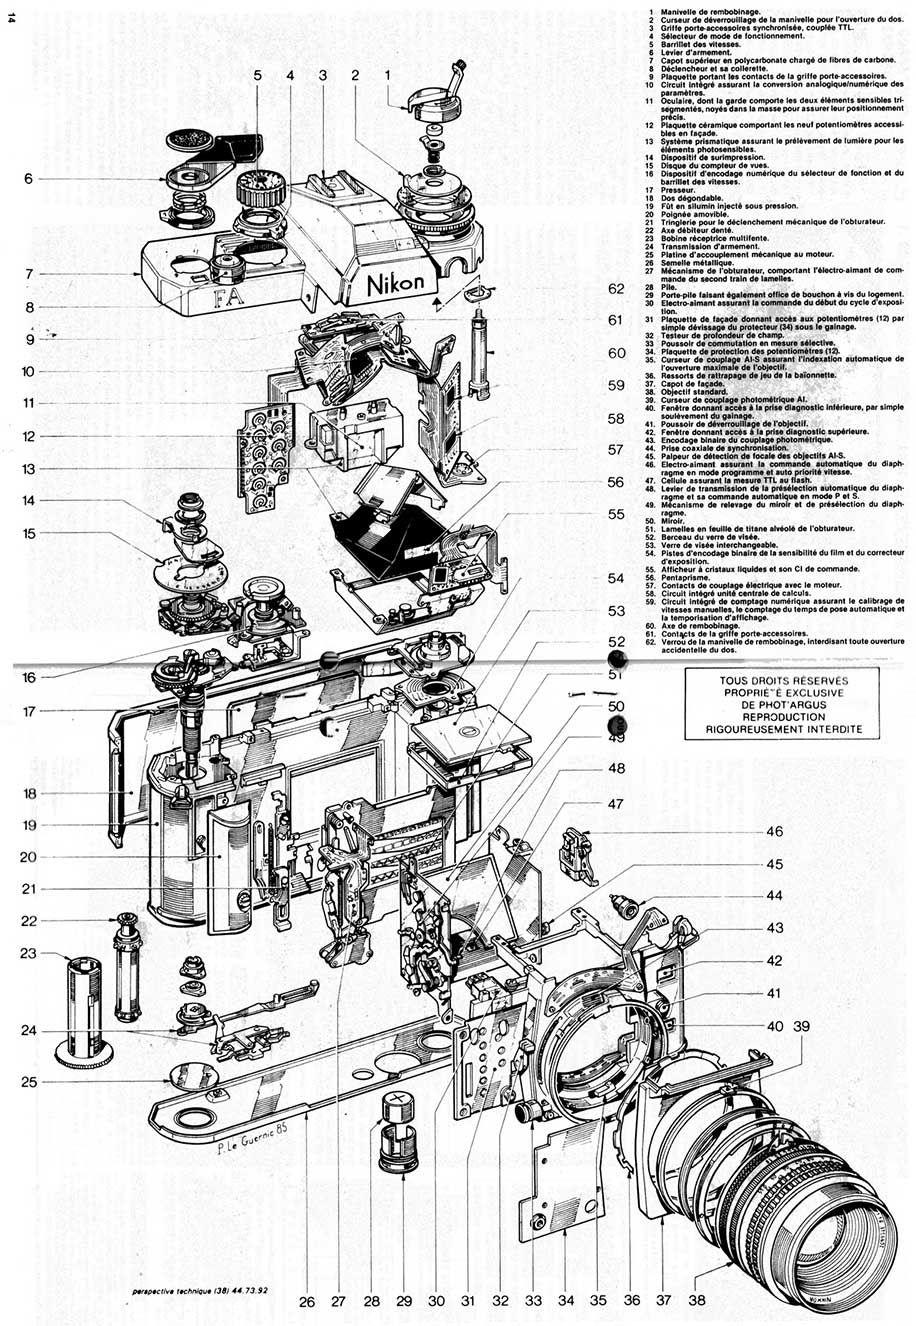 mechanical schematics of those old nikon f film cameras